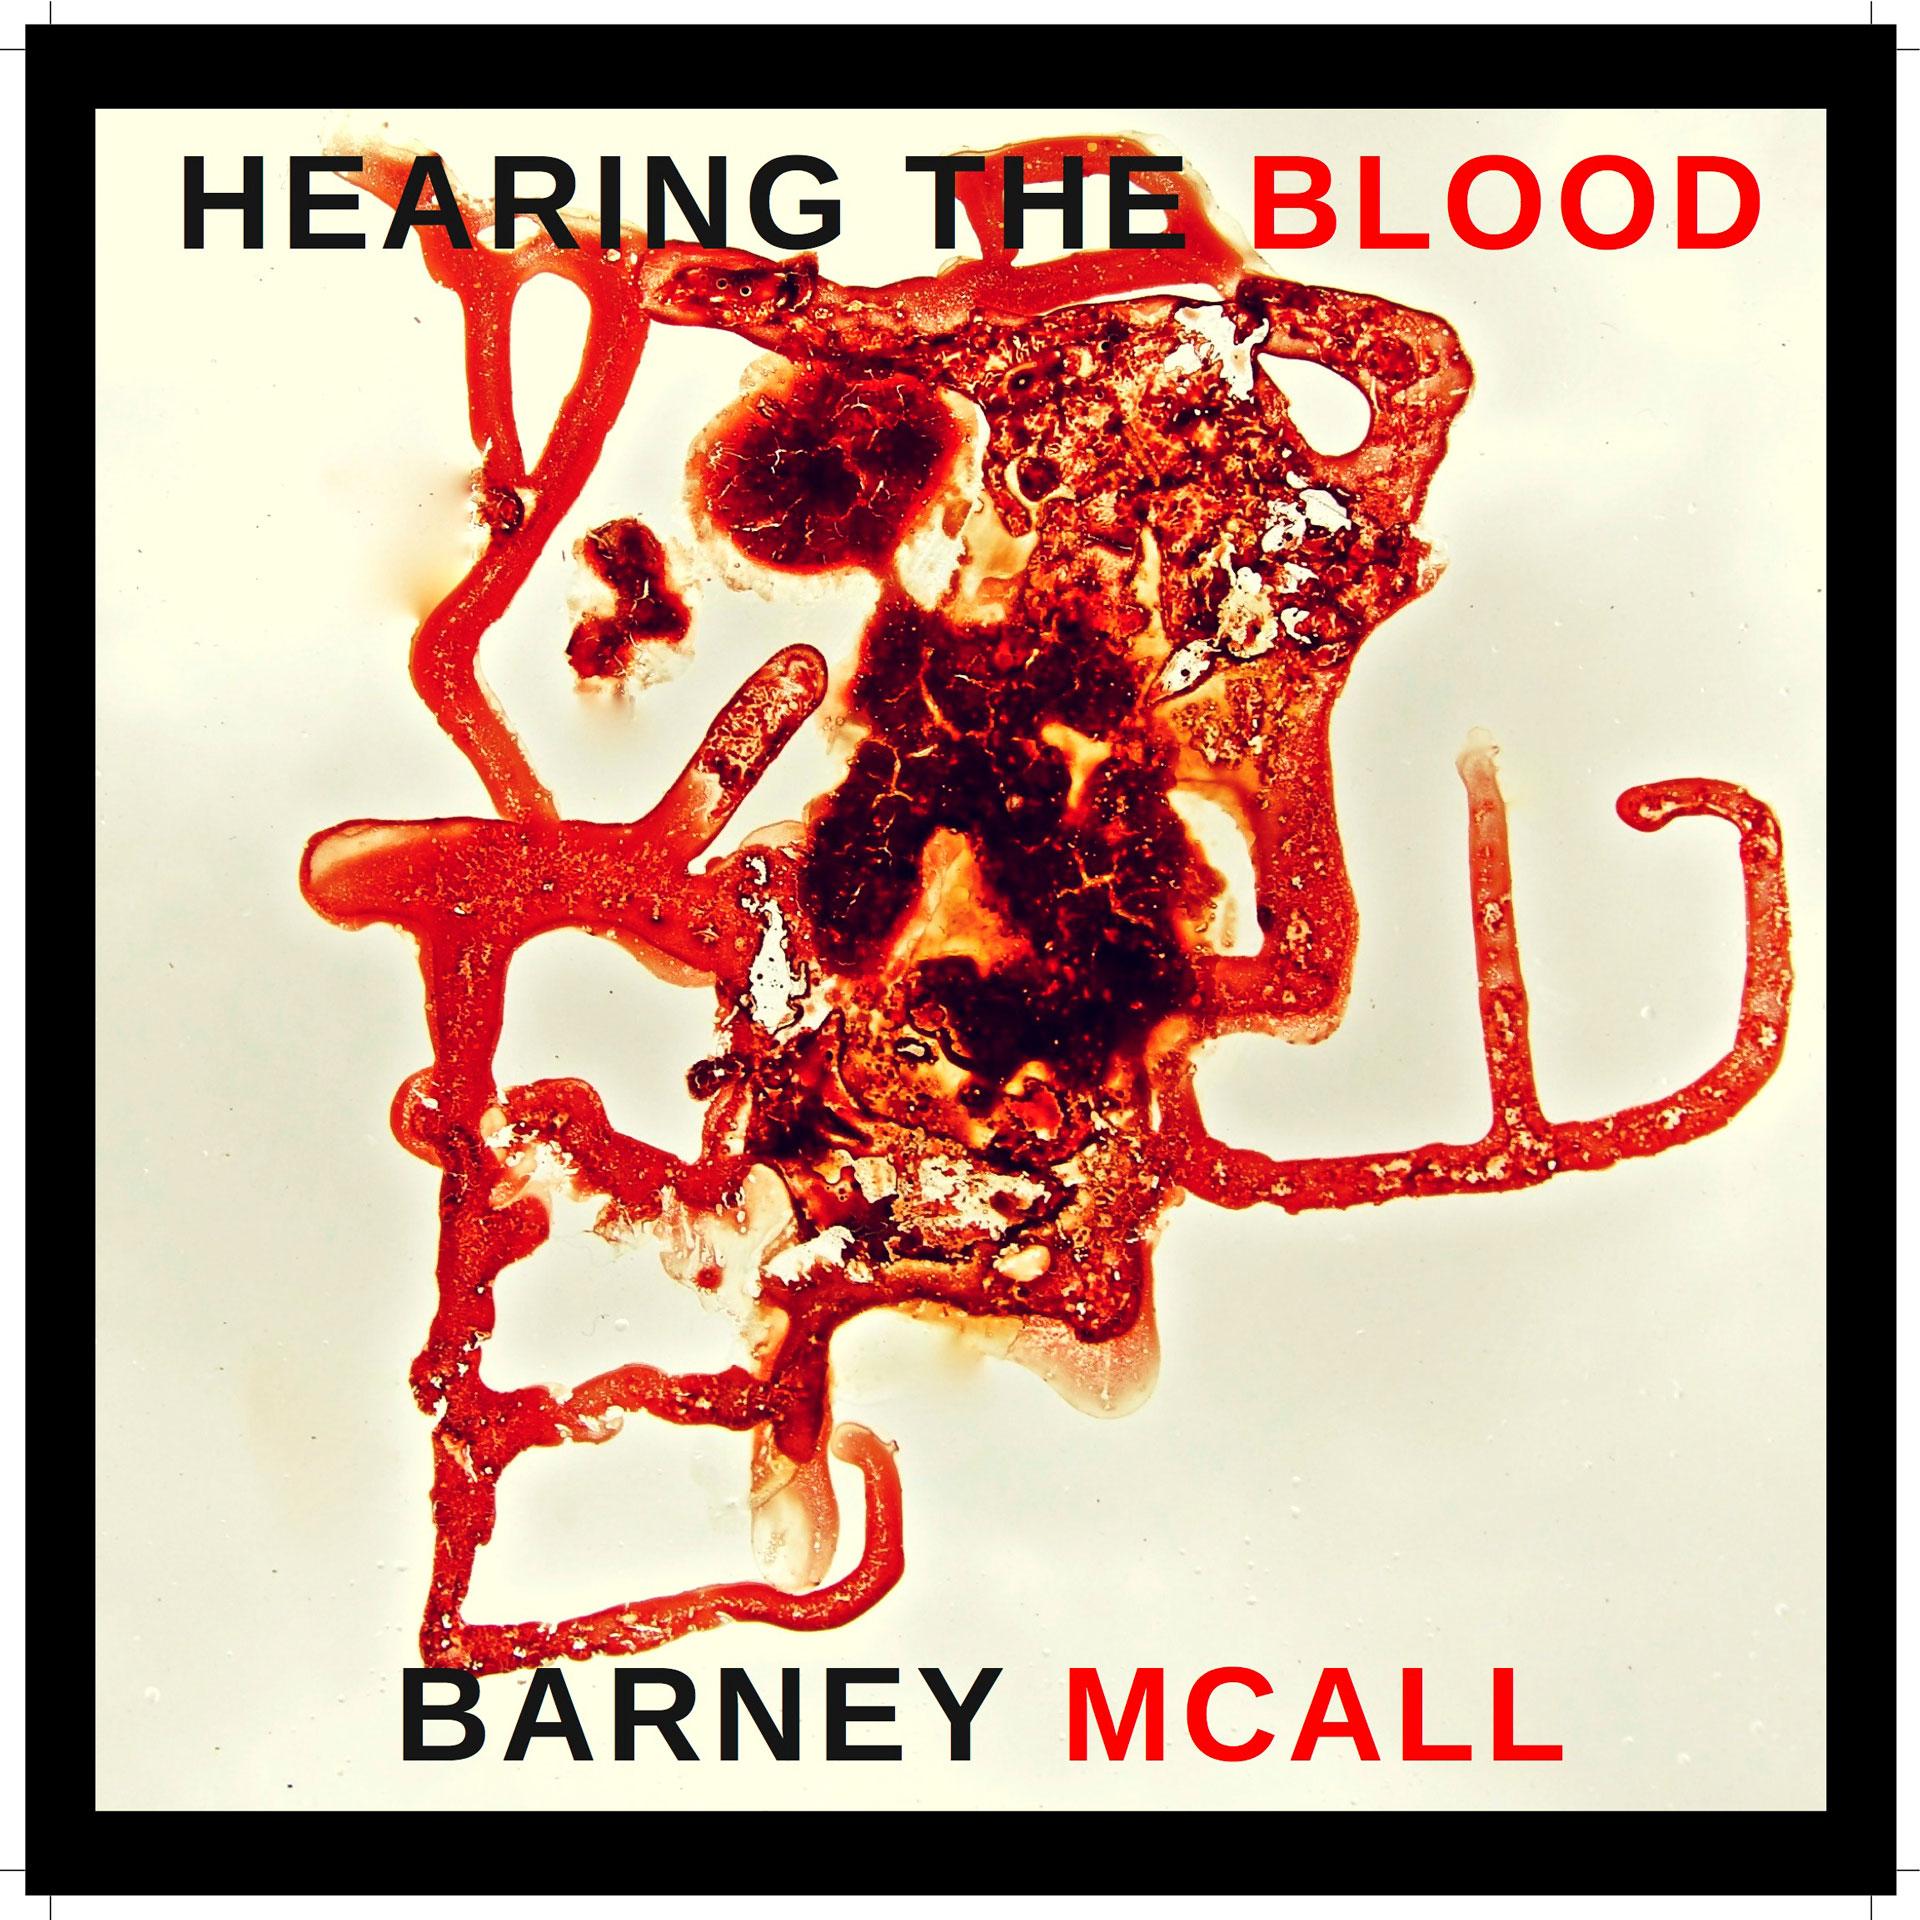 McAllBarneyHearingTheBloodAlbumCover.jpg